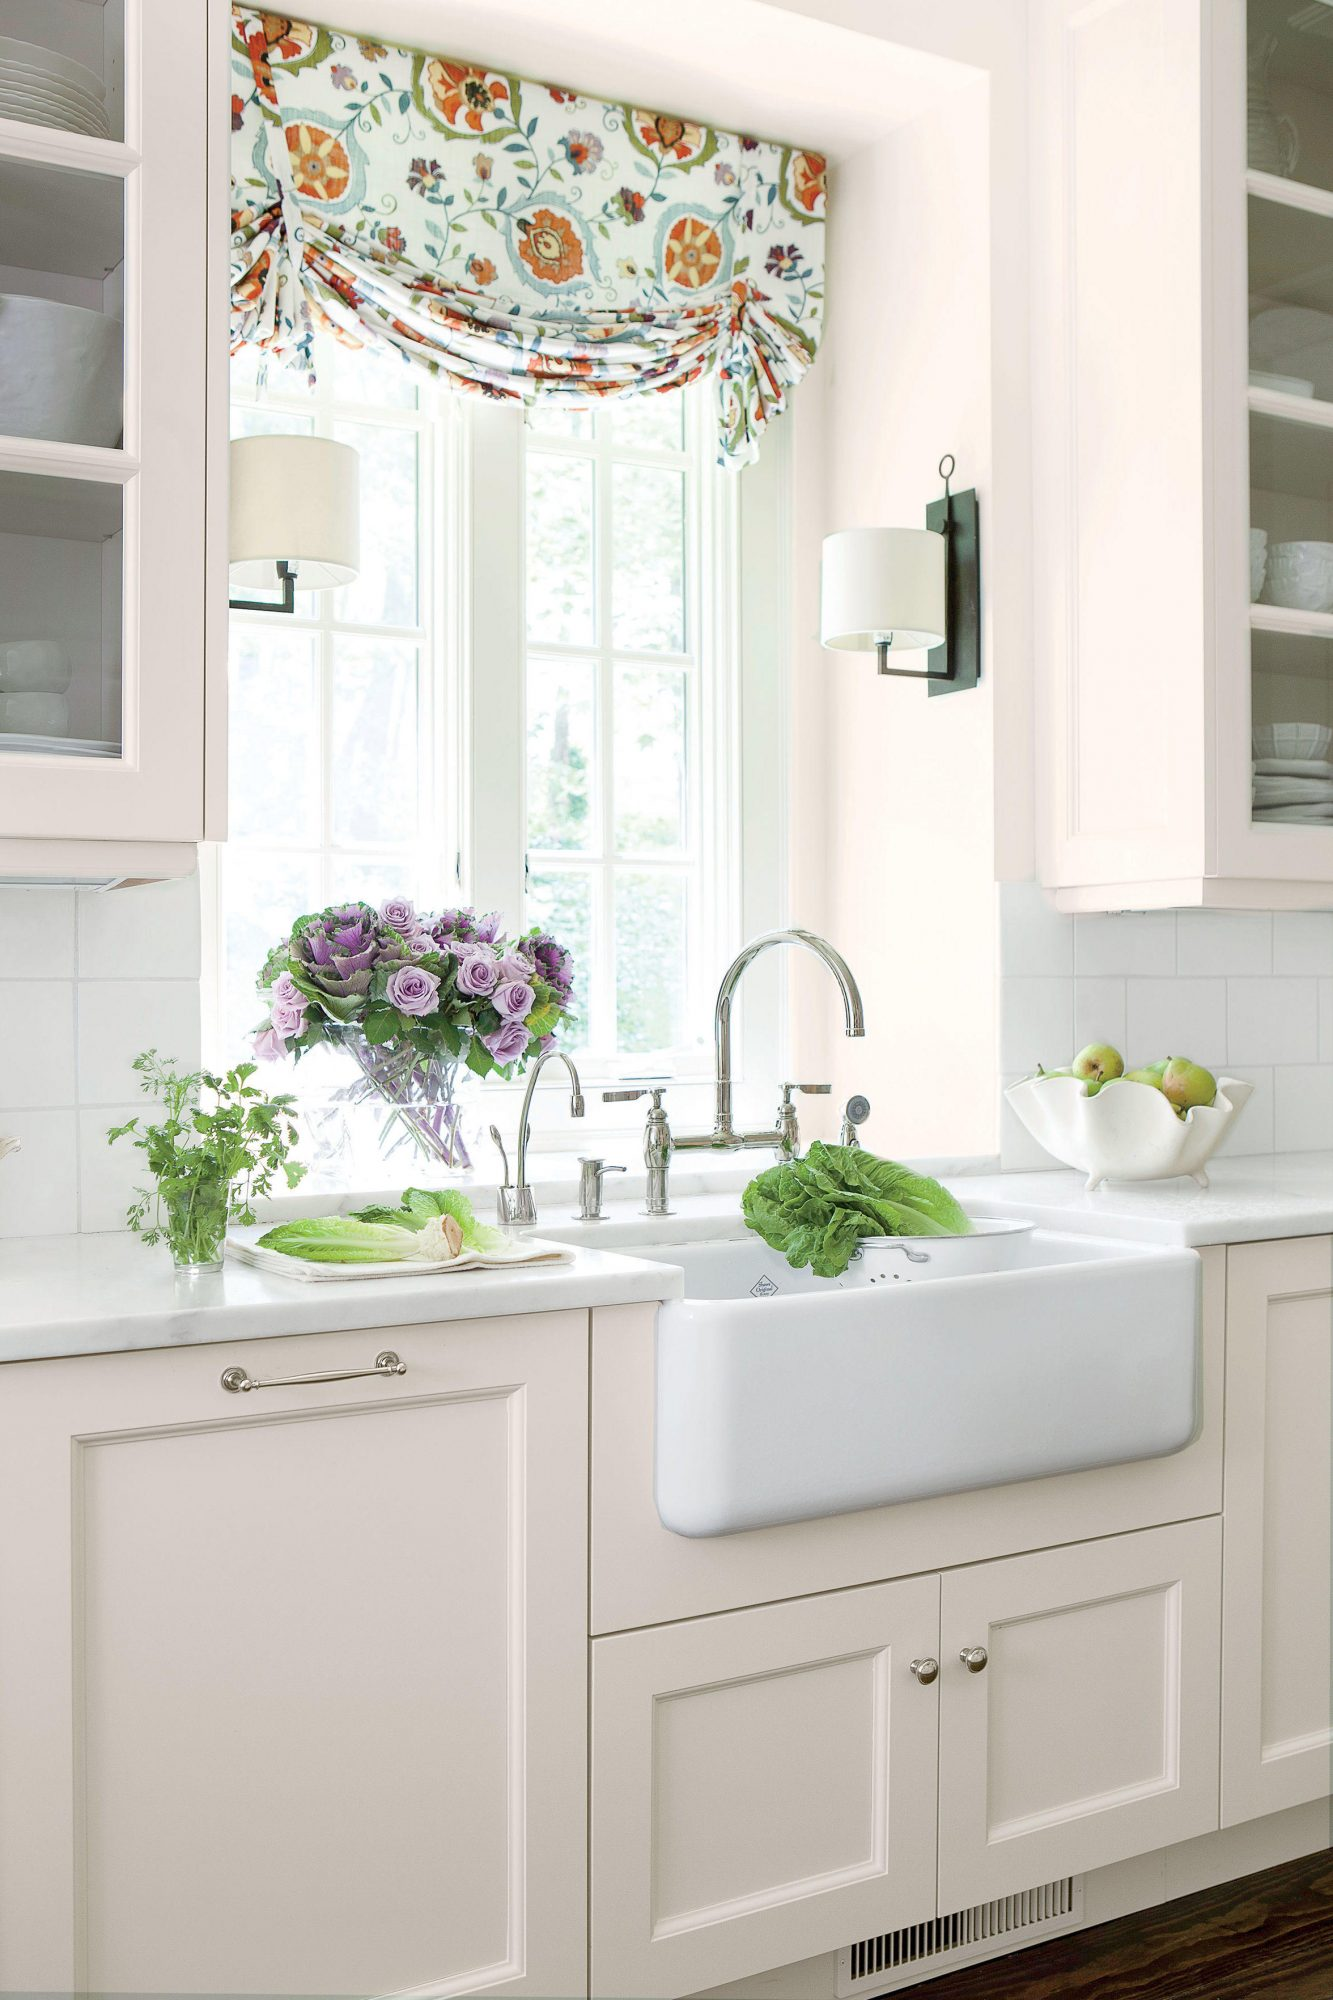 The Details: Farmhouse Sink